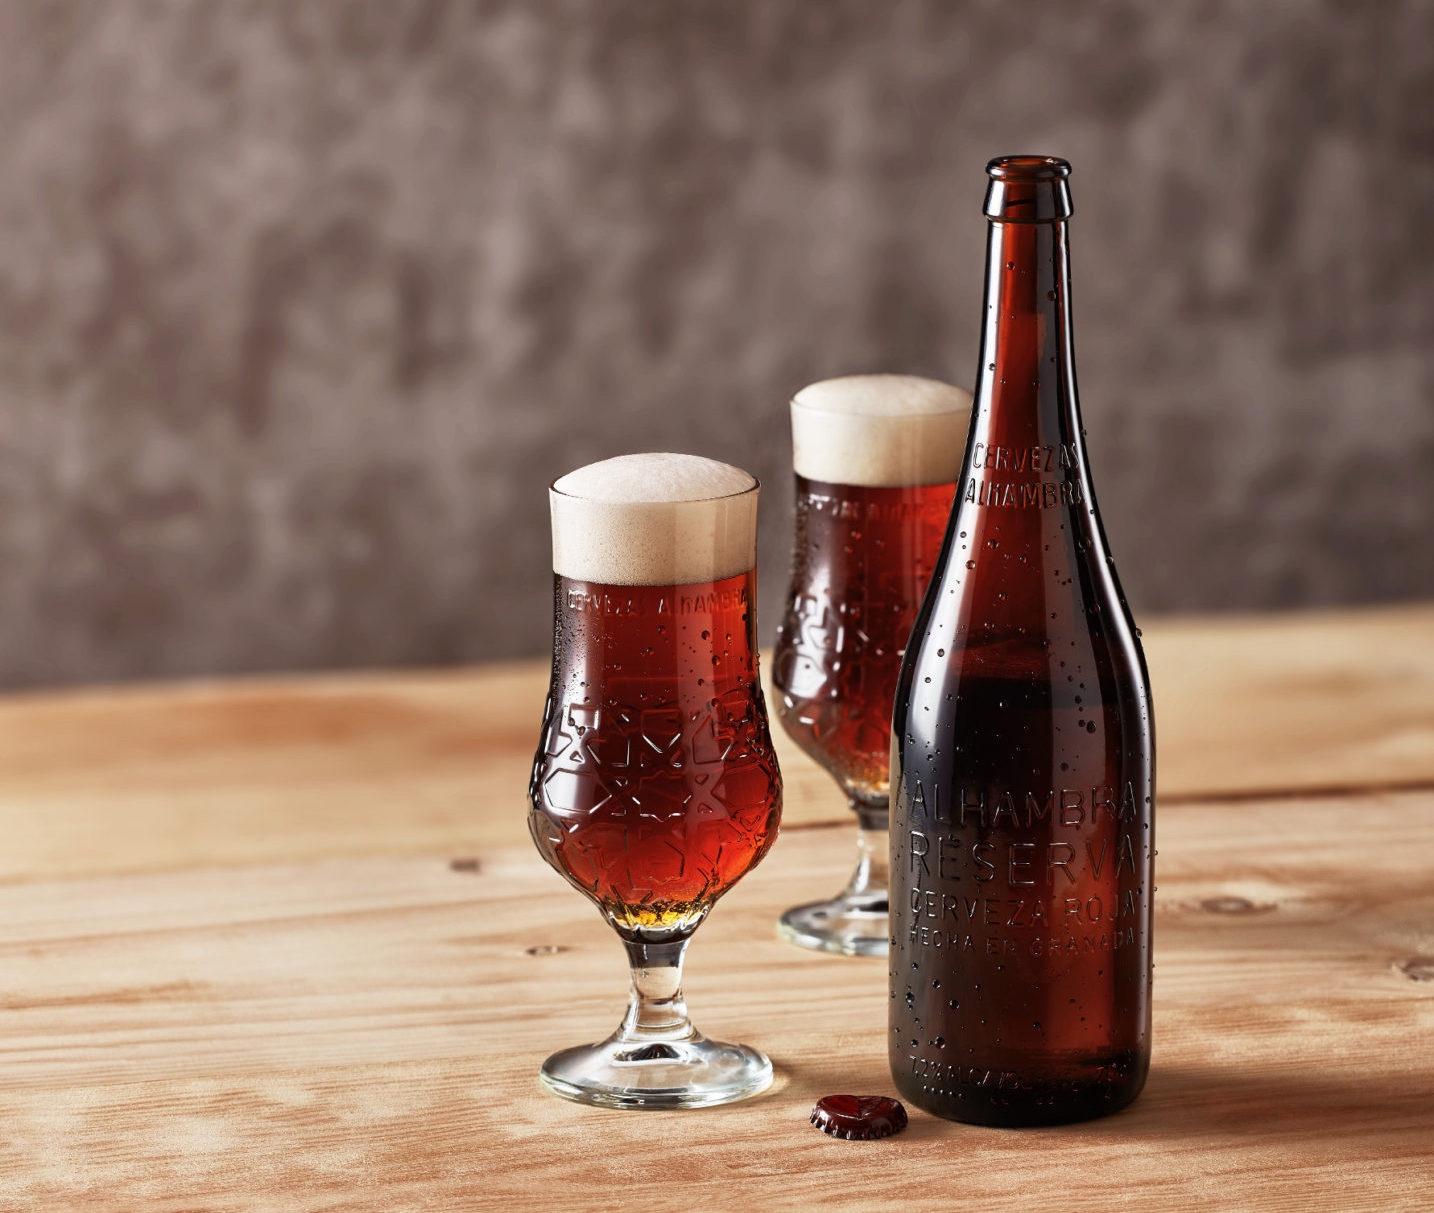 Cervezas Alhambra lanza 'Alhambra Reserva Roja', botella de 70cl para compartir